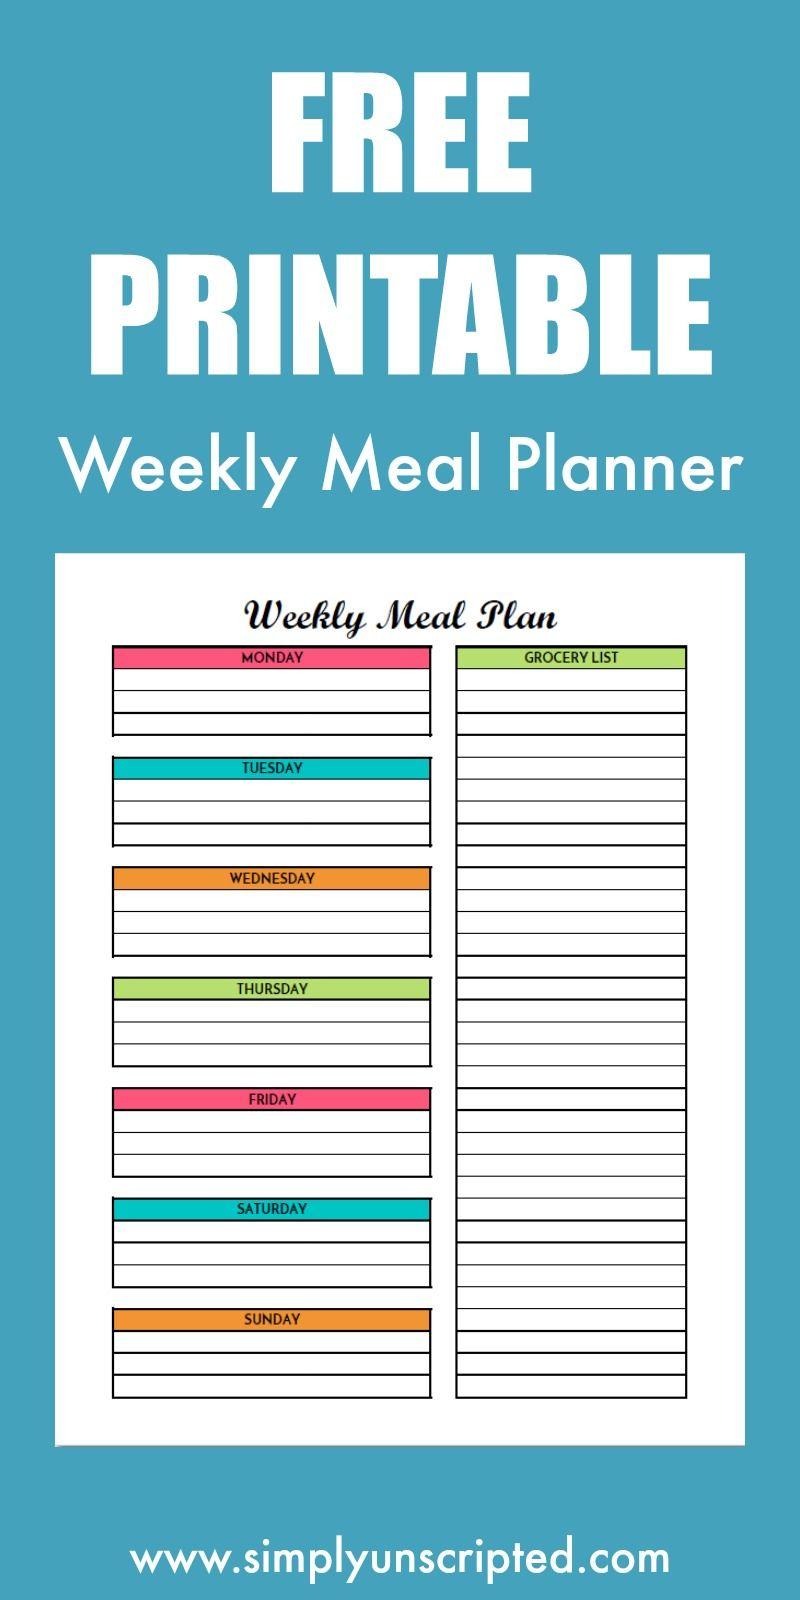 Free Weekly Meal Planning Printable With Grocery List | Free - Create A Menu Free Printable